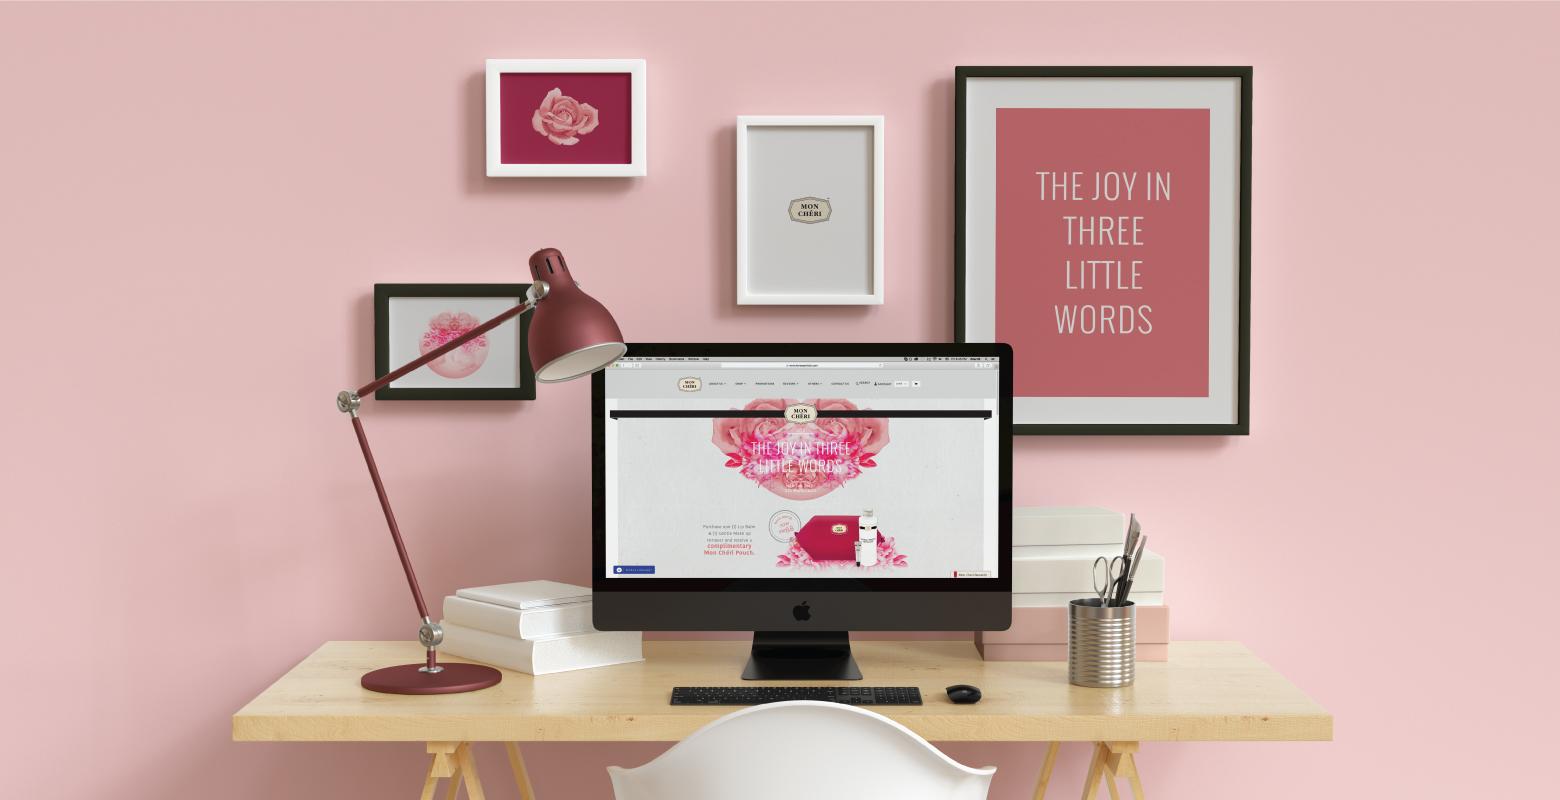 Mon Cheri Webpage and desk